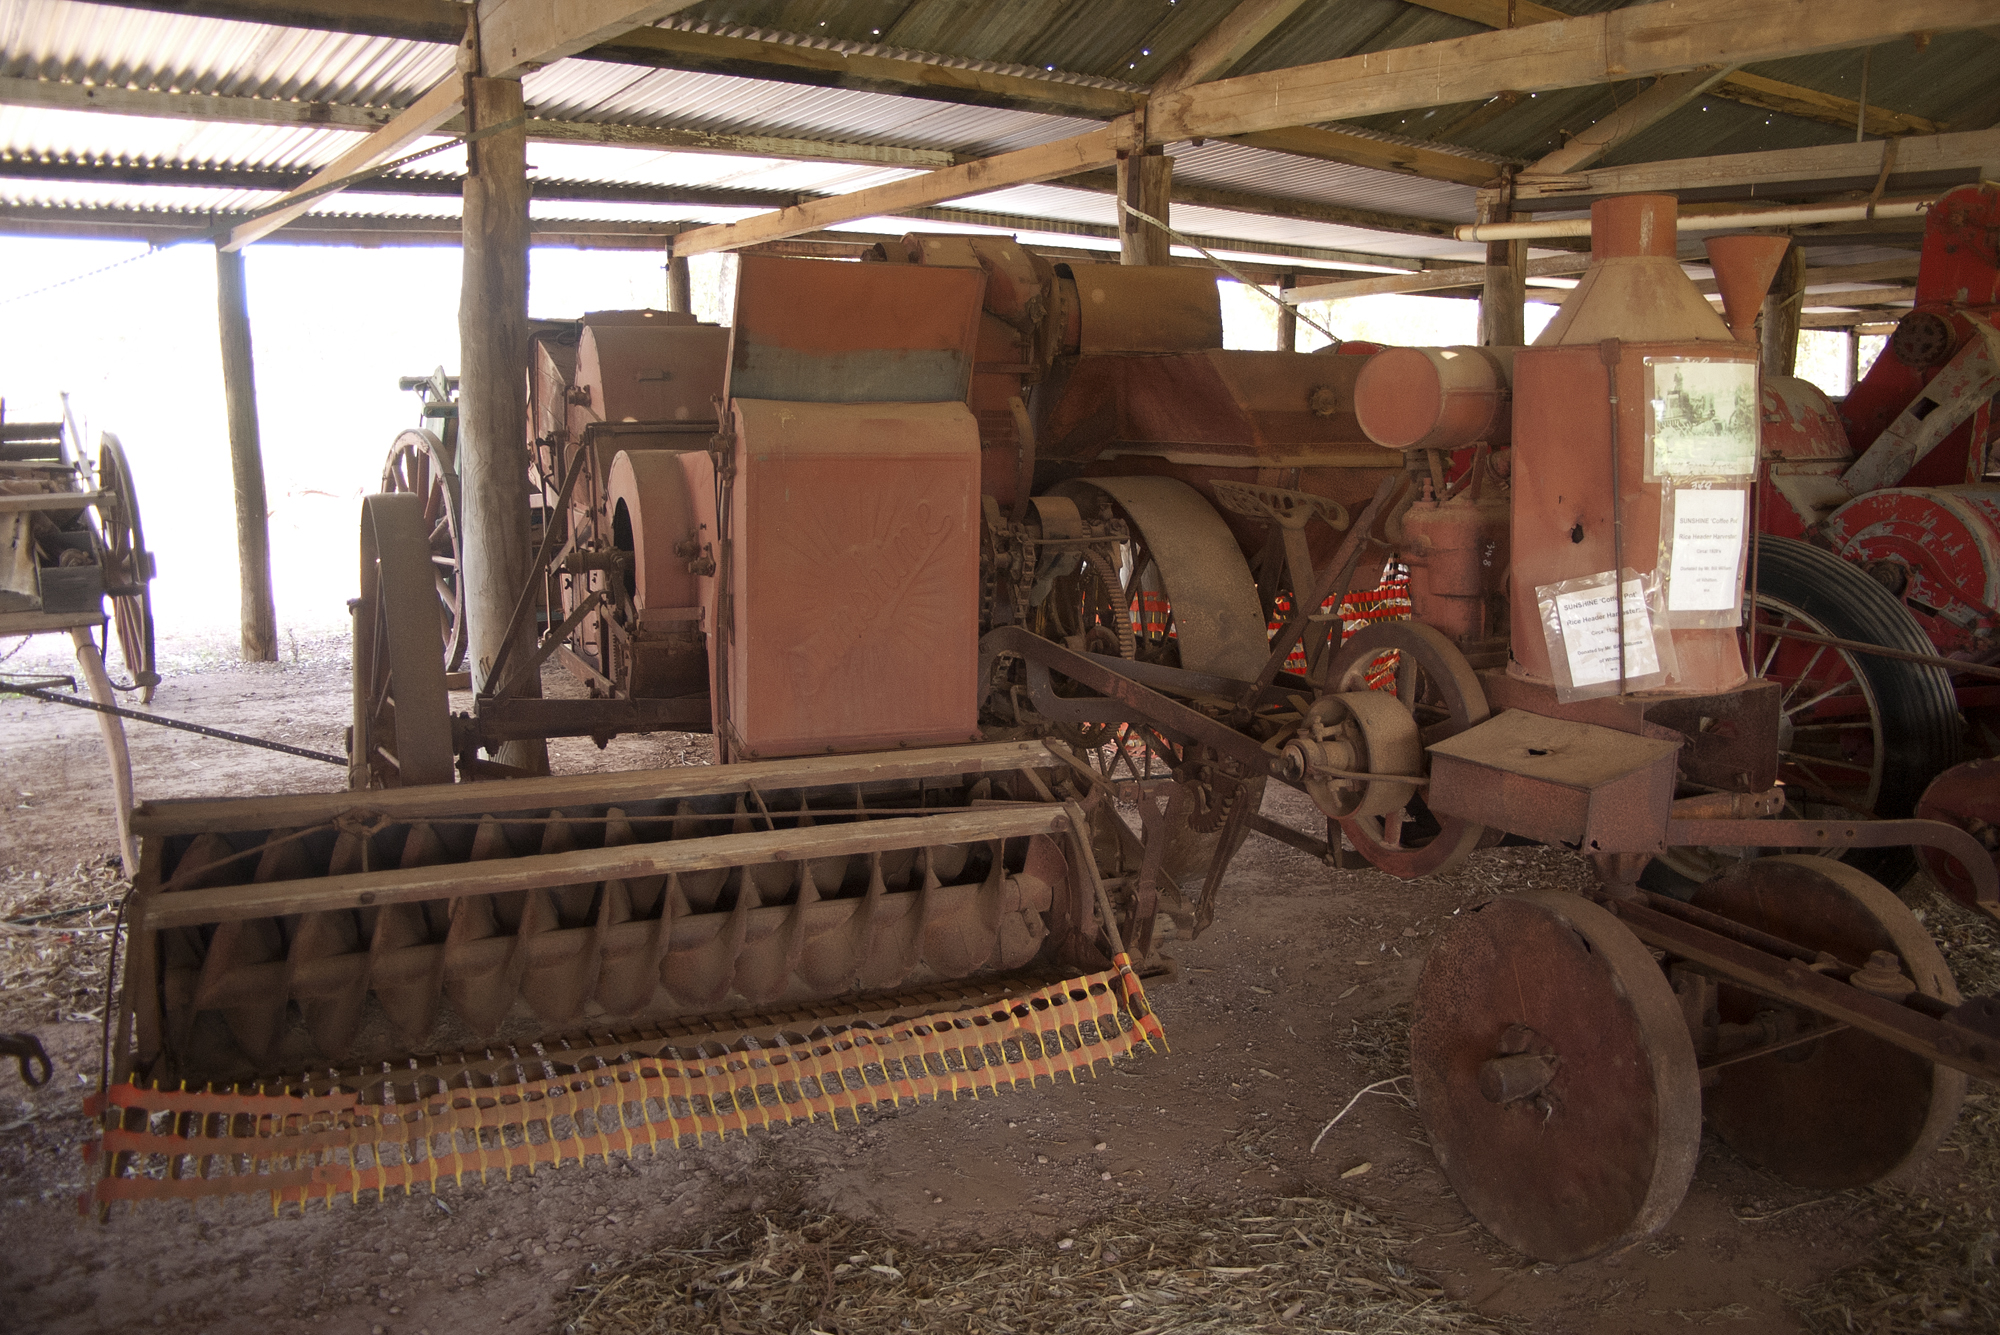 File:Sunshine Rice Combine Harvester jpg - Wikimedia Commons